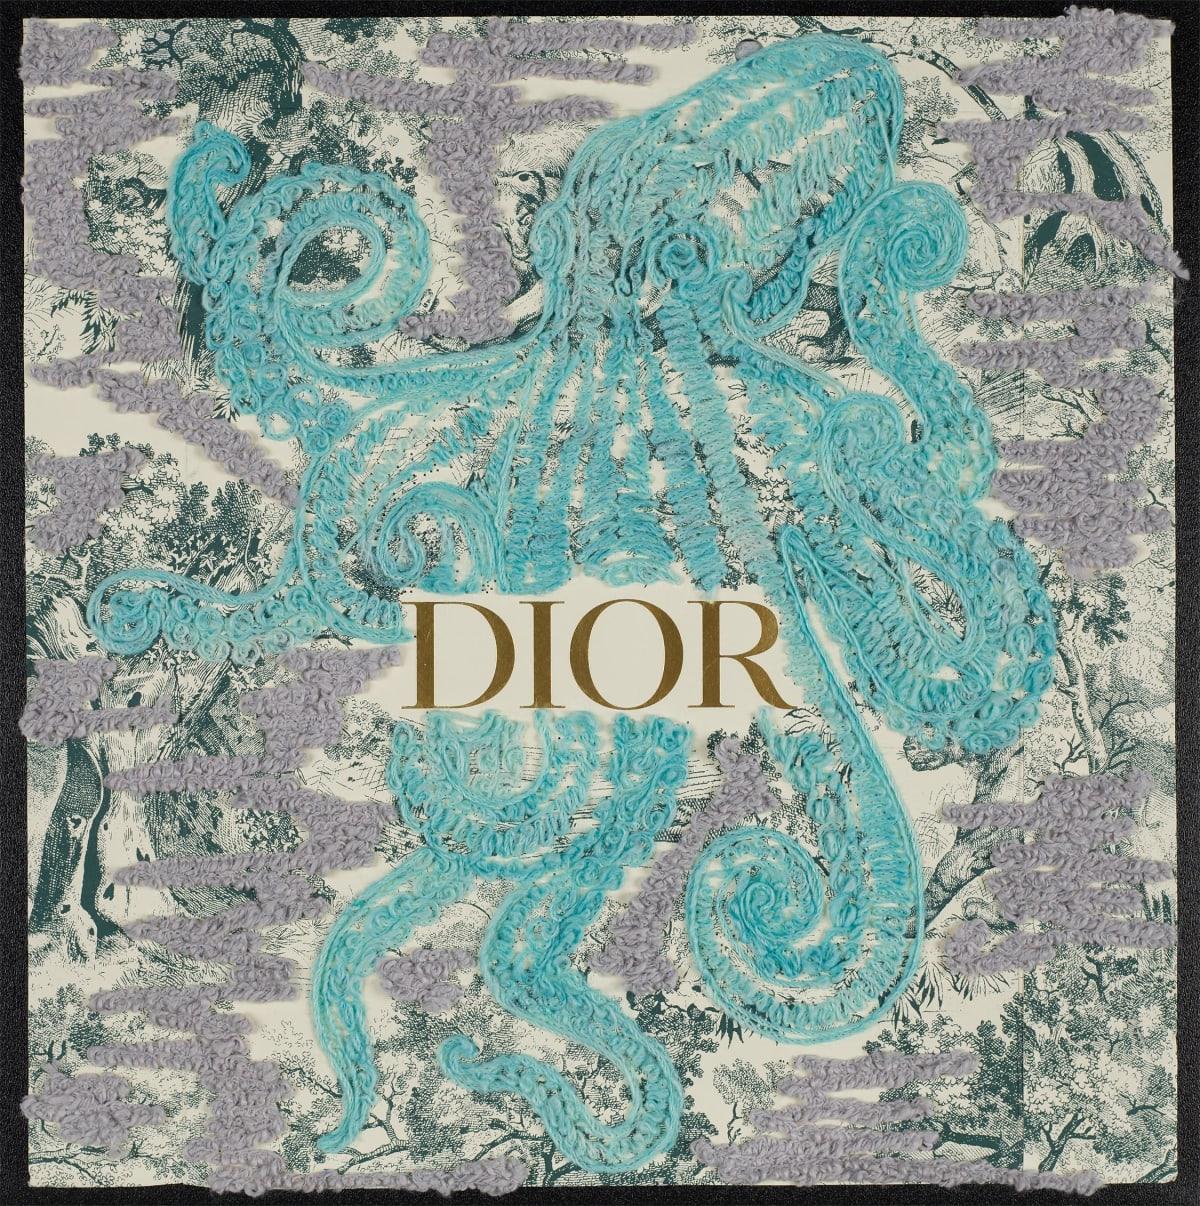 Stephen Wilson, Dior Giant , 2019